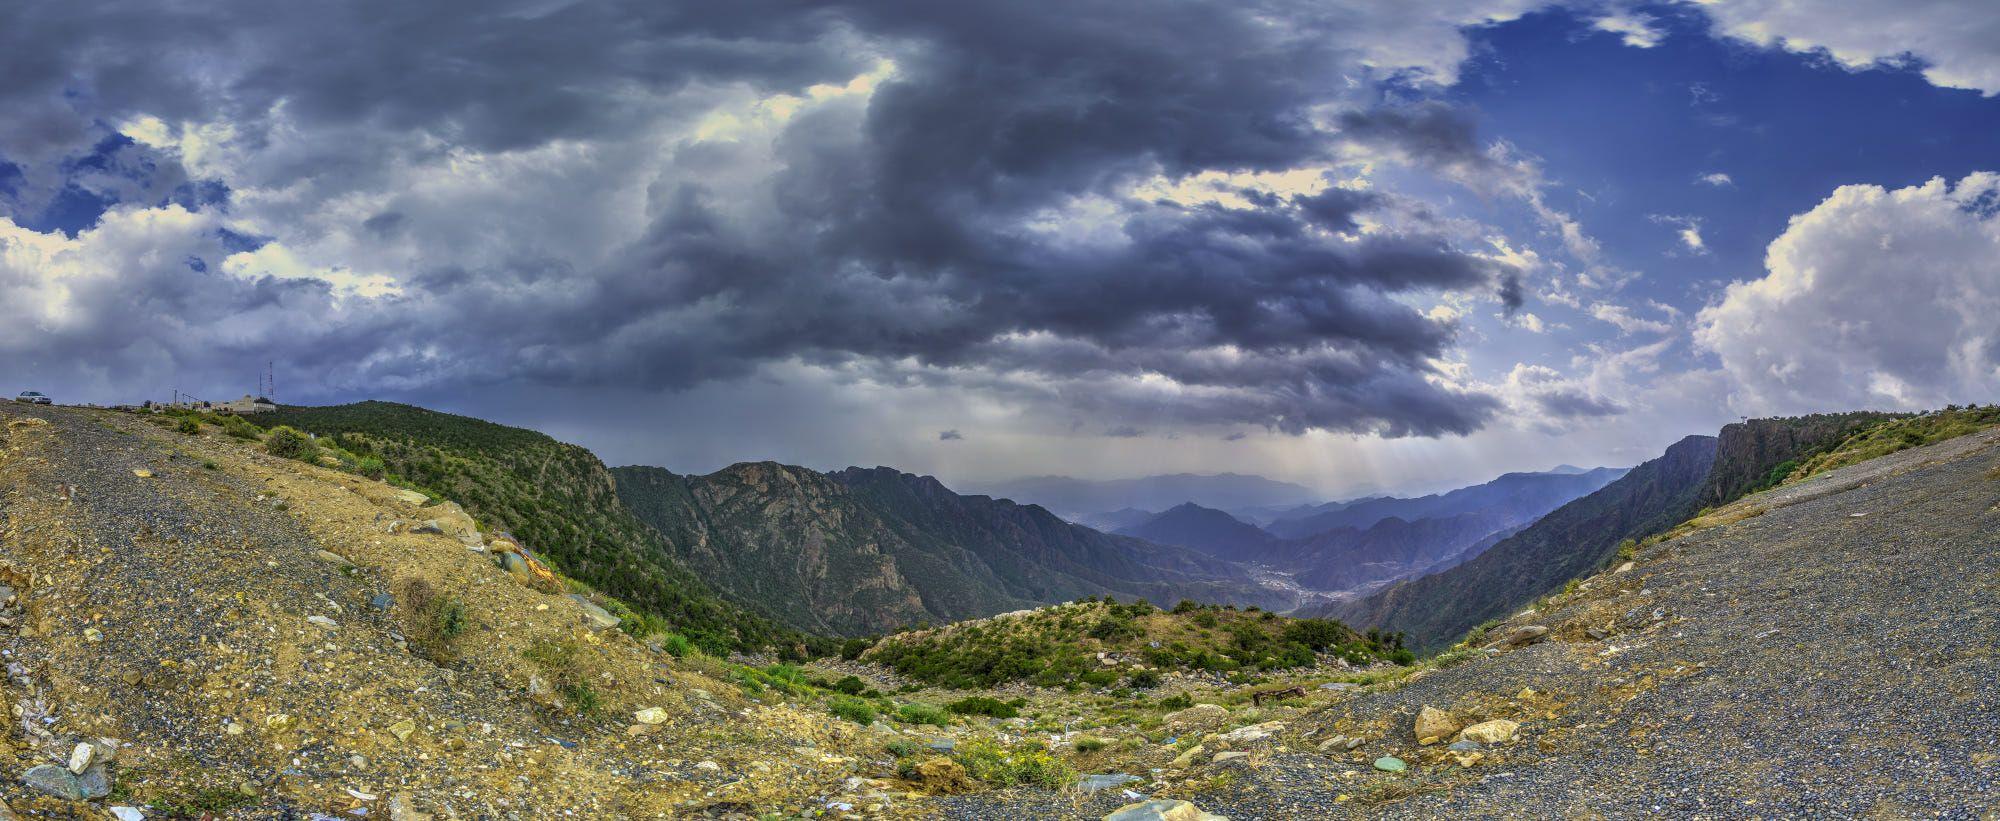 HDR 360 panorama from Abha Natural landmarks, Panorama